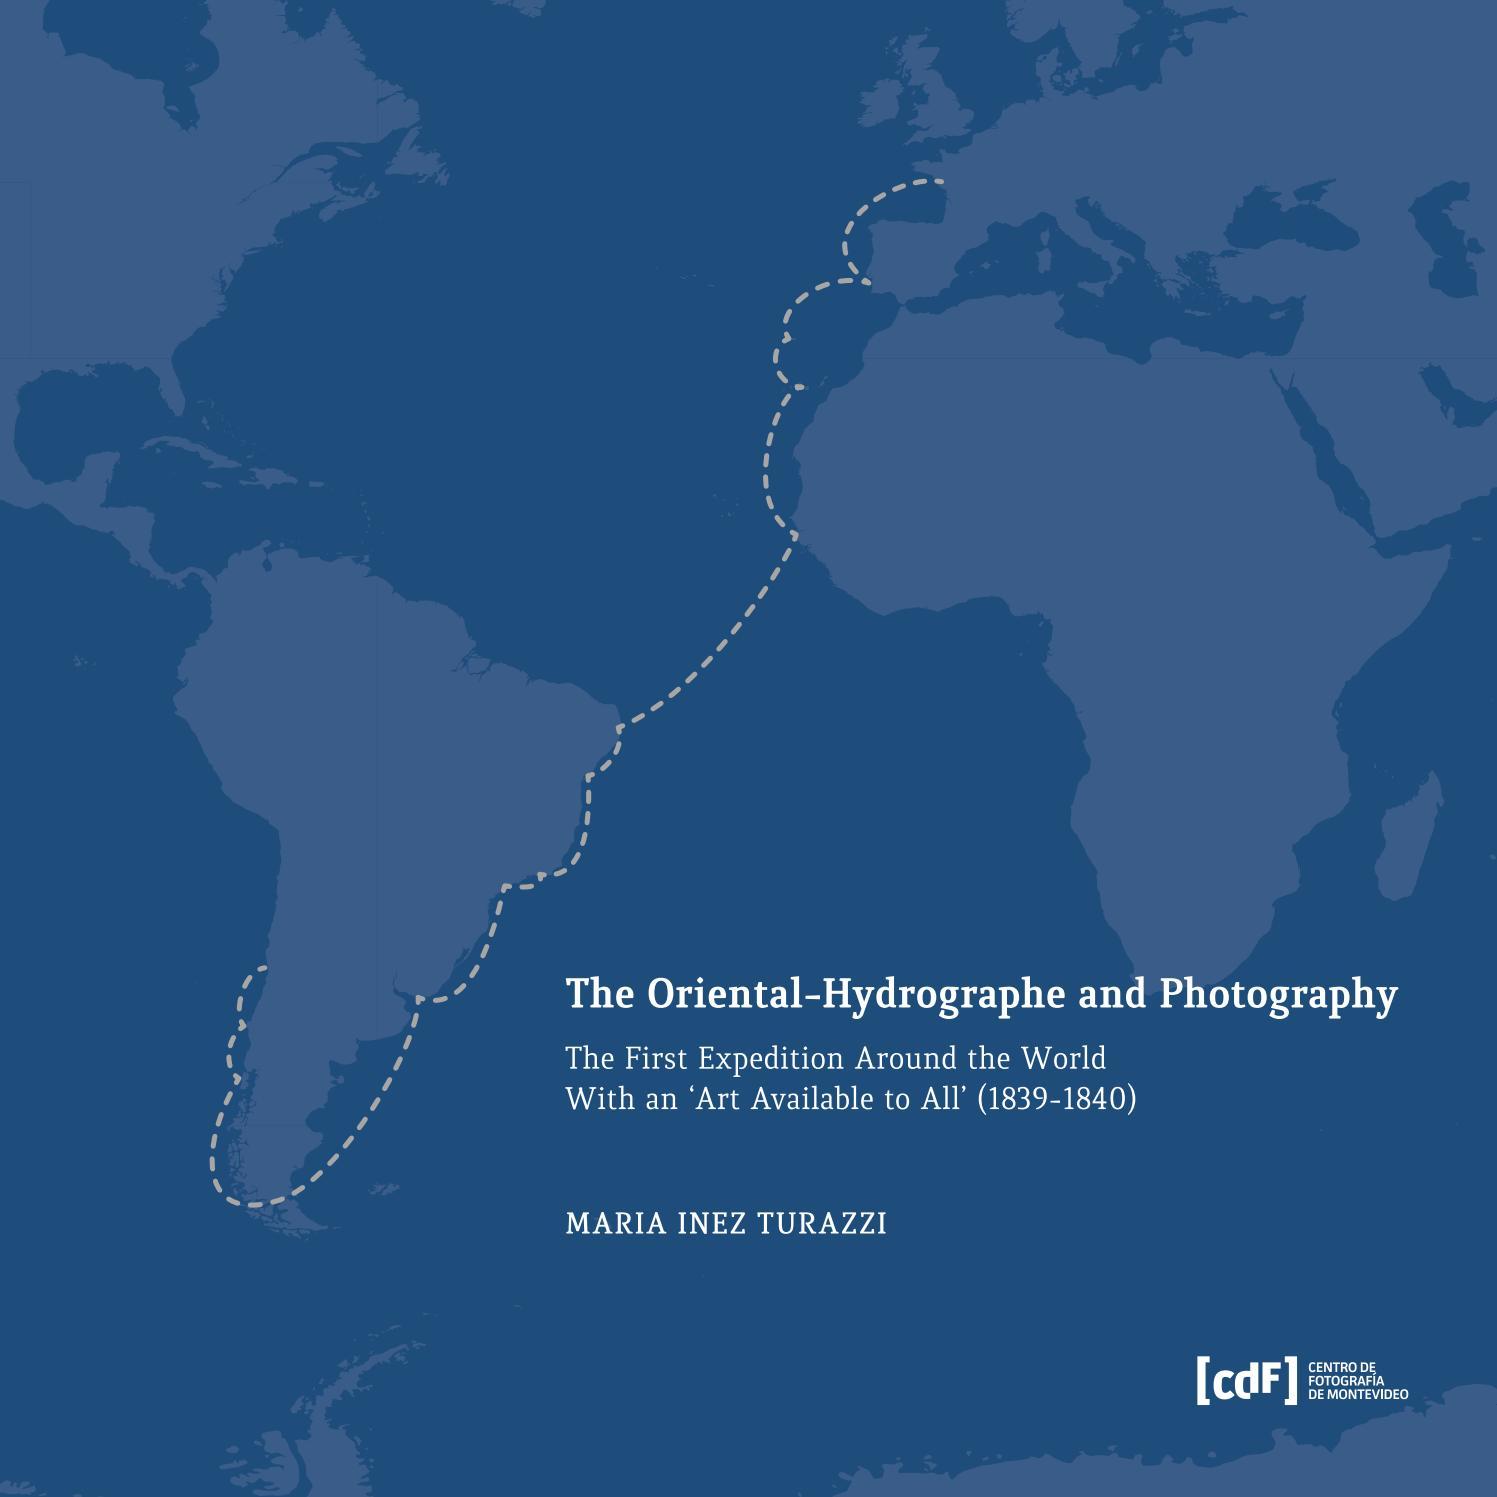 The Oriental Hydrographe And Photography By Centro De Fotografía De Montevideo Issuu